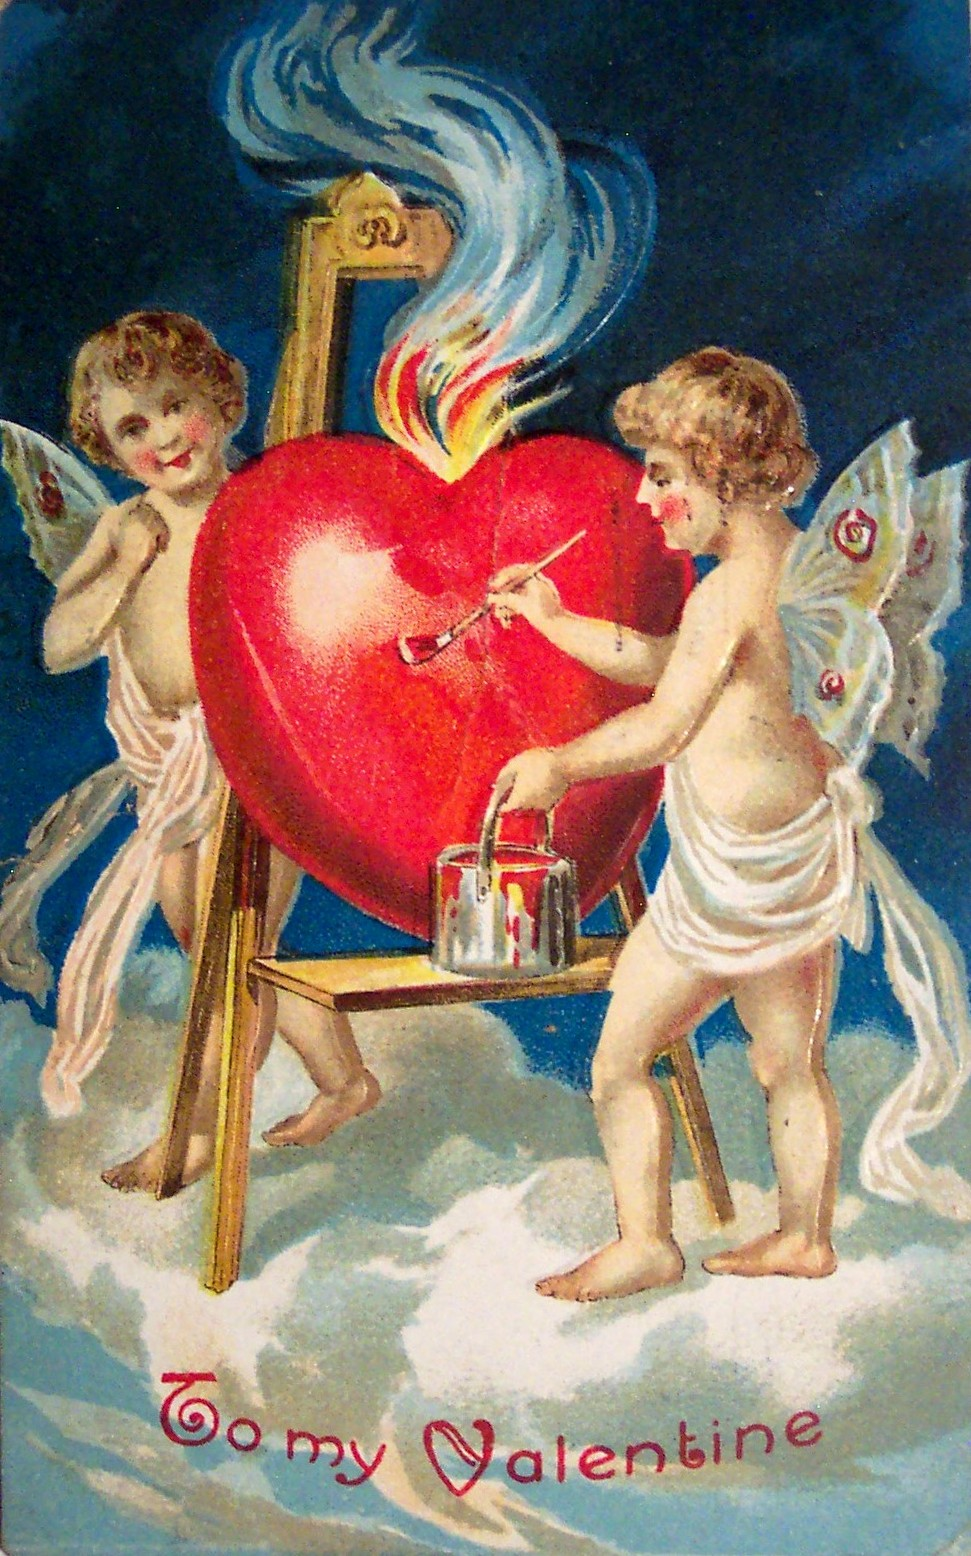 Valentine's tradition